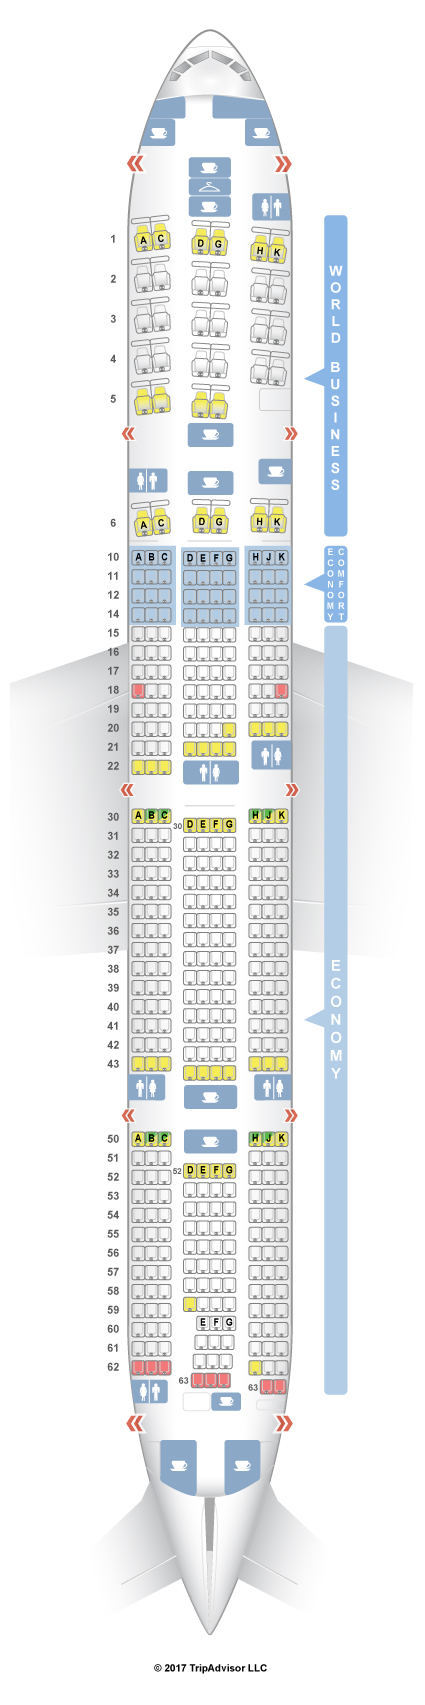 Seatguru Seat Map Klm Boeing 777 300er 77w